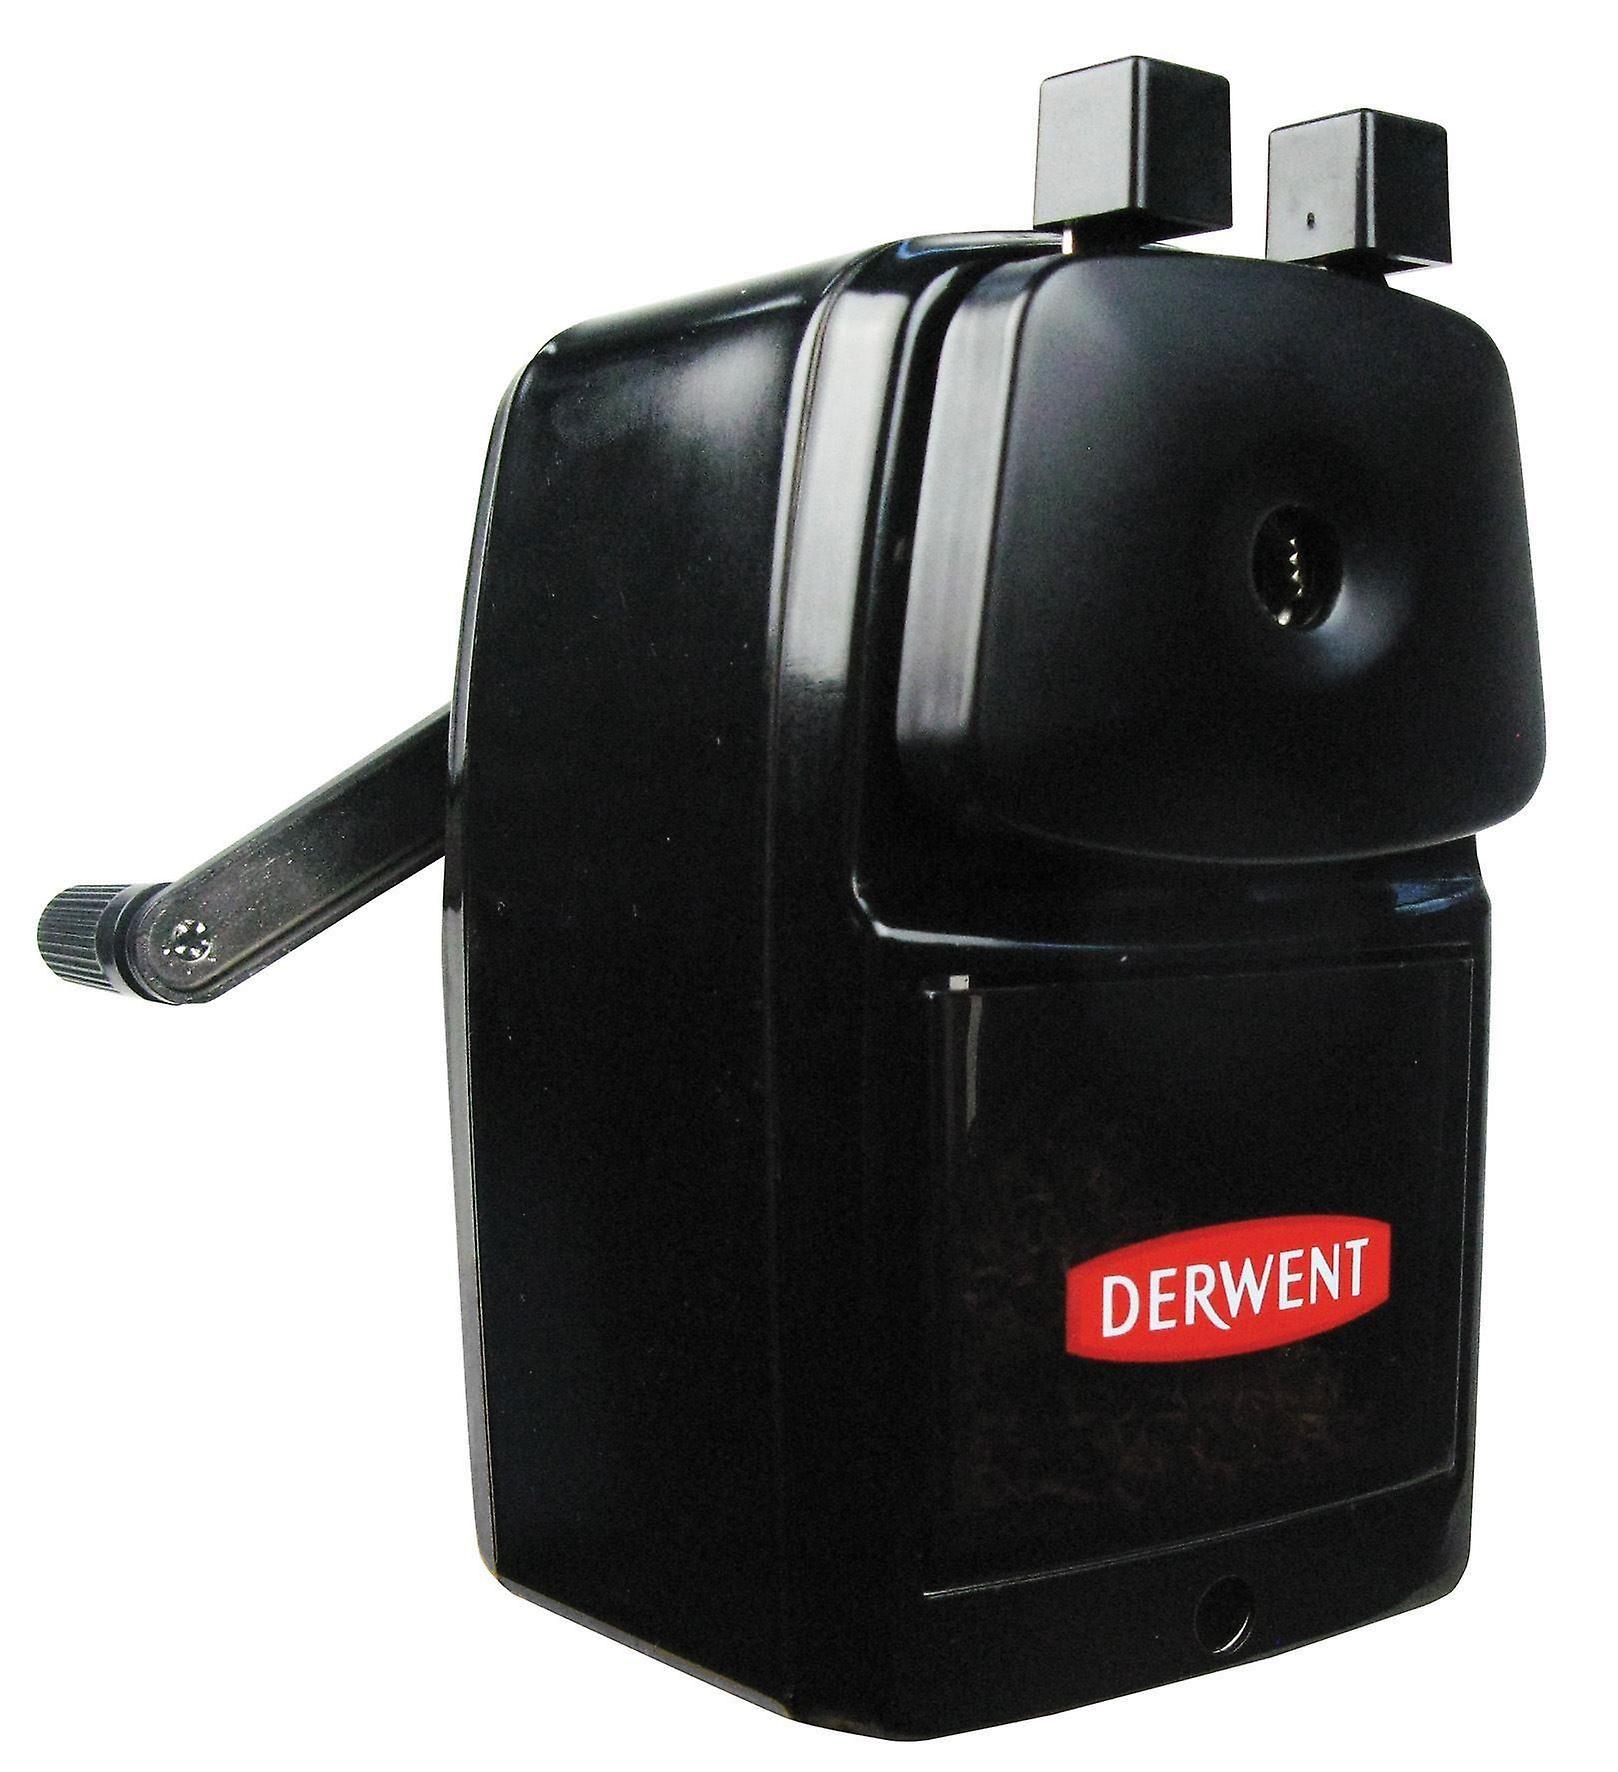 Derwent super point manual sharpener pencil sharpener